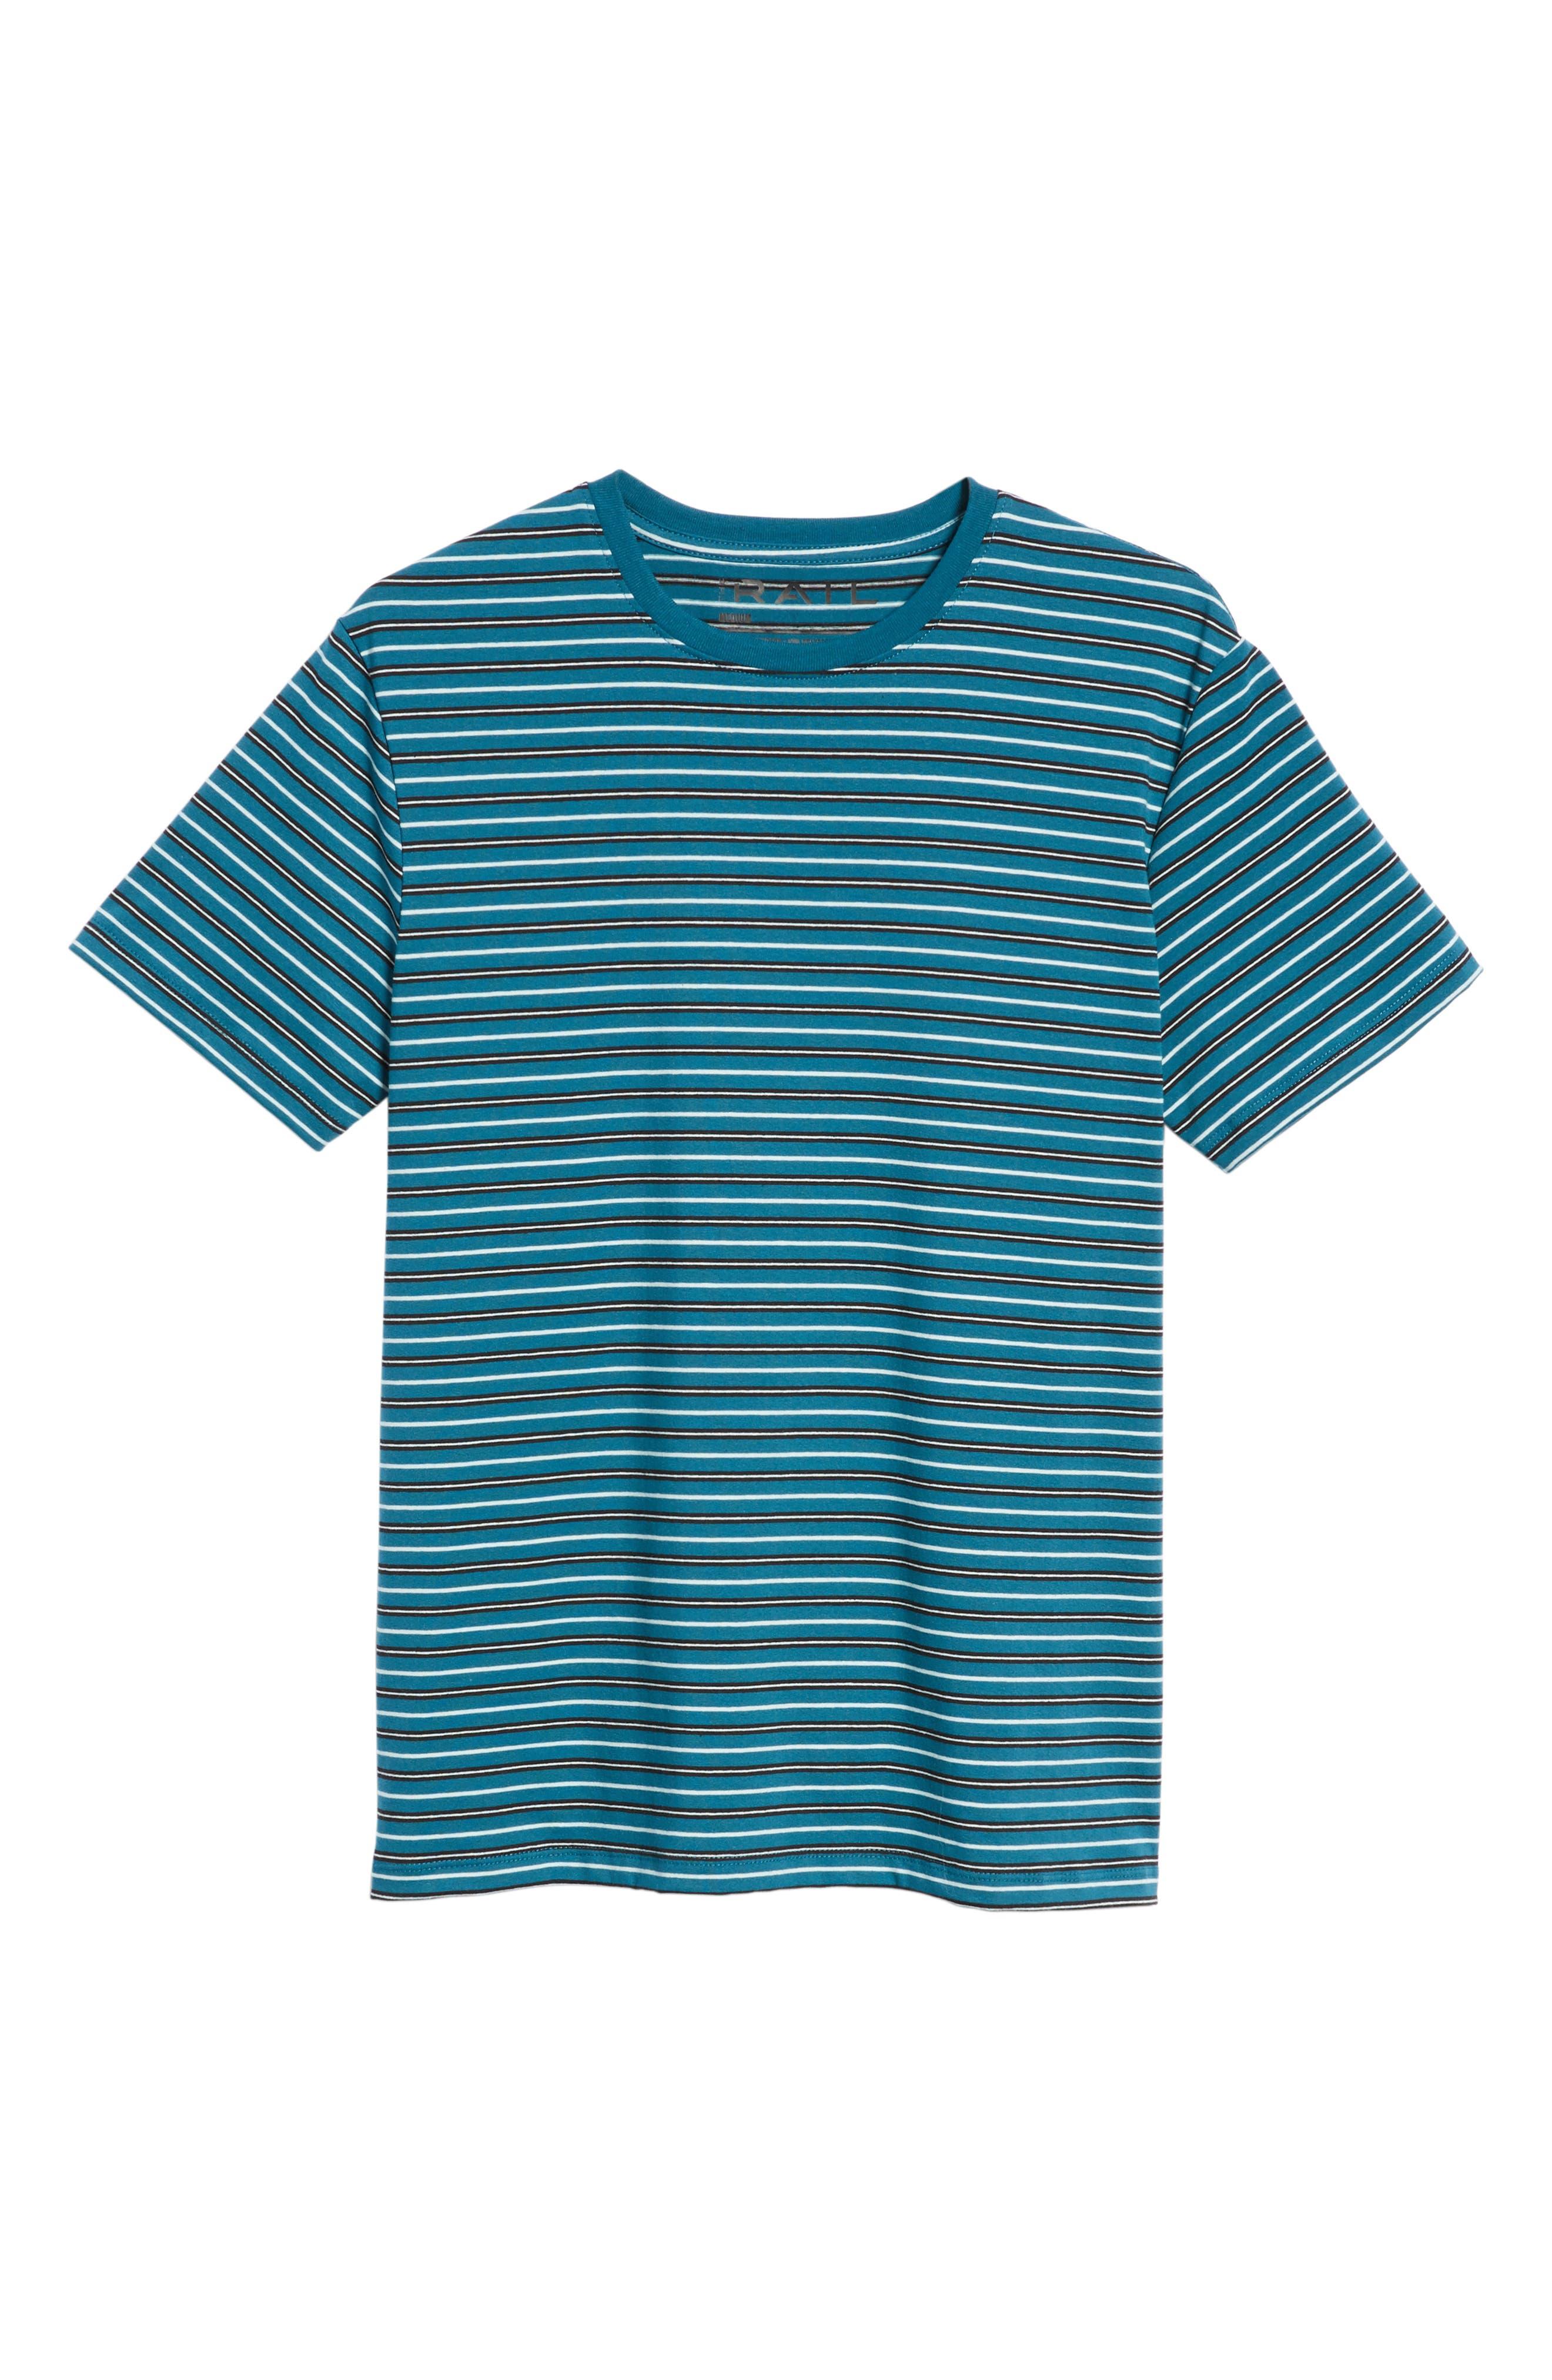 Striped T-Shirt,                             Alternate thumbnail 6, color,                             TEAL GREEN-WHITE STRIPE